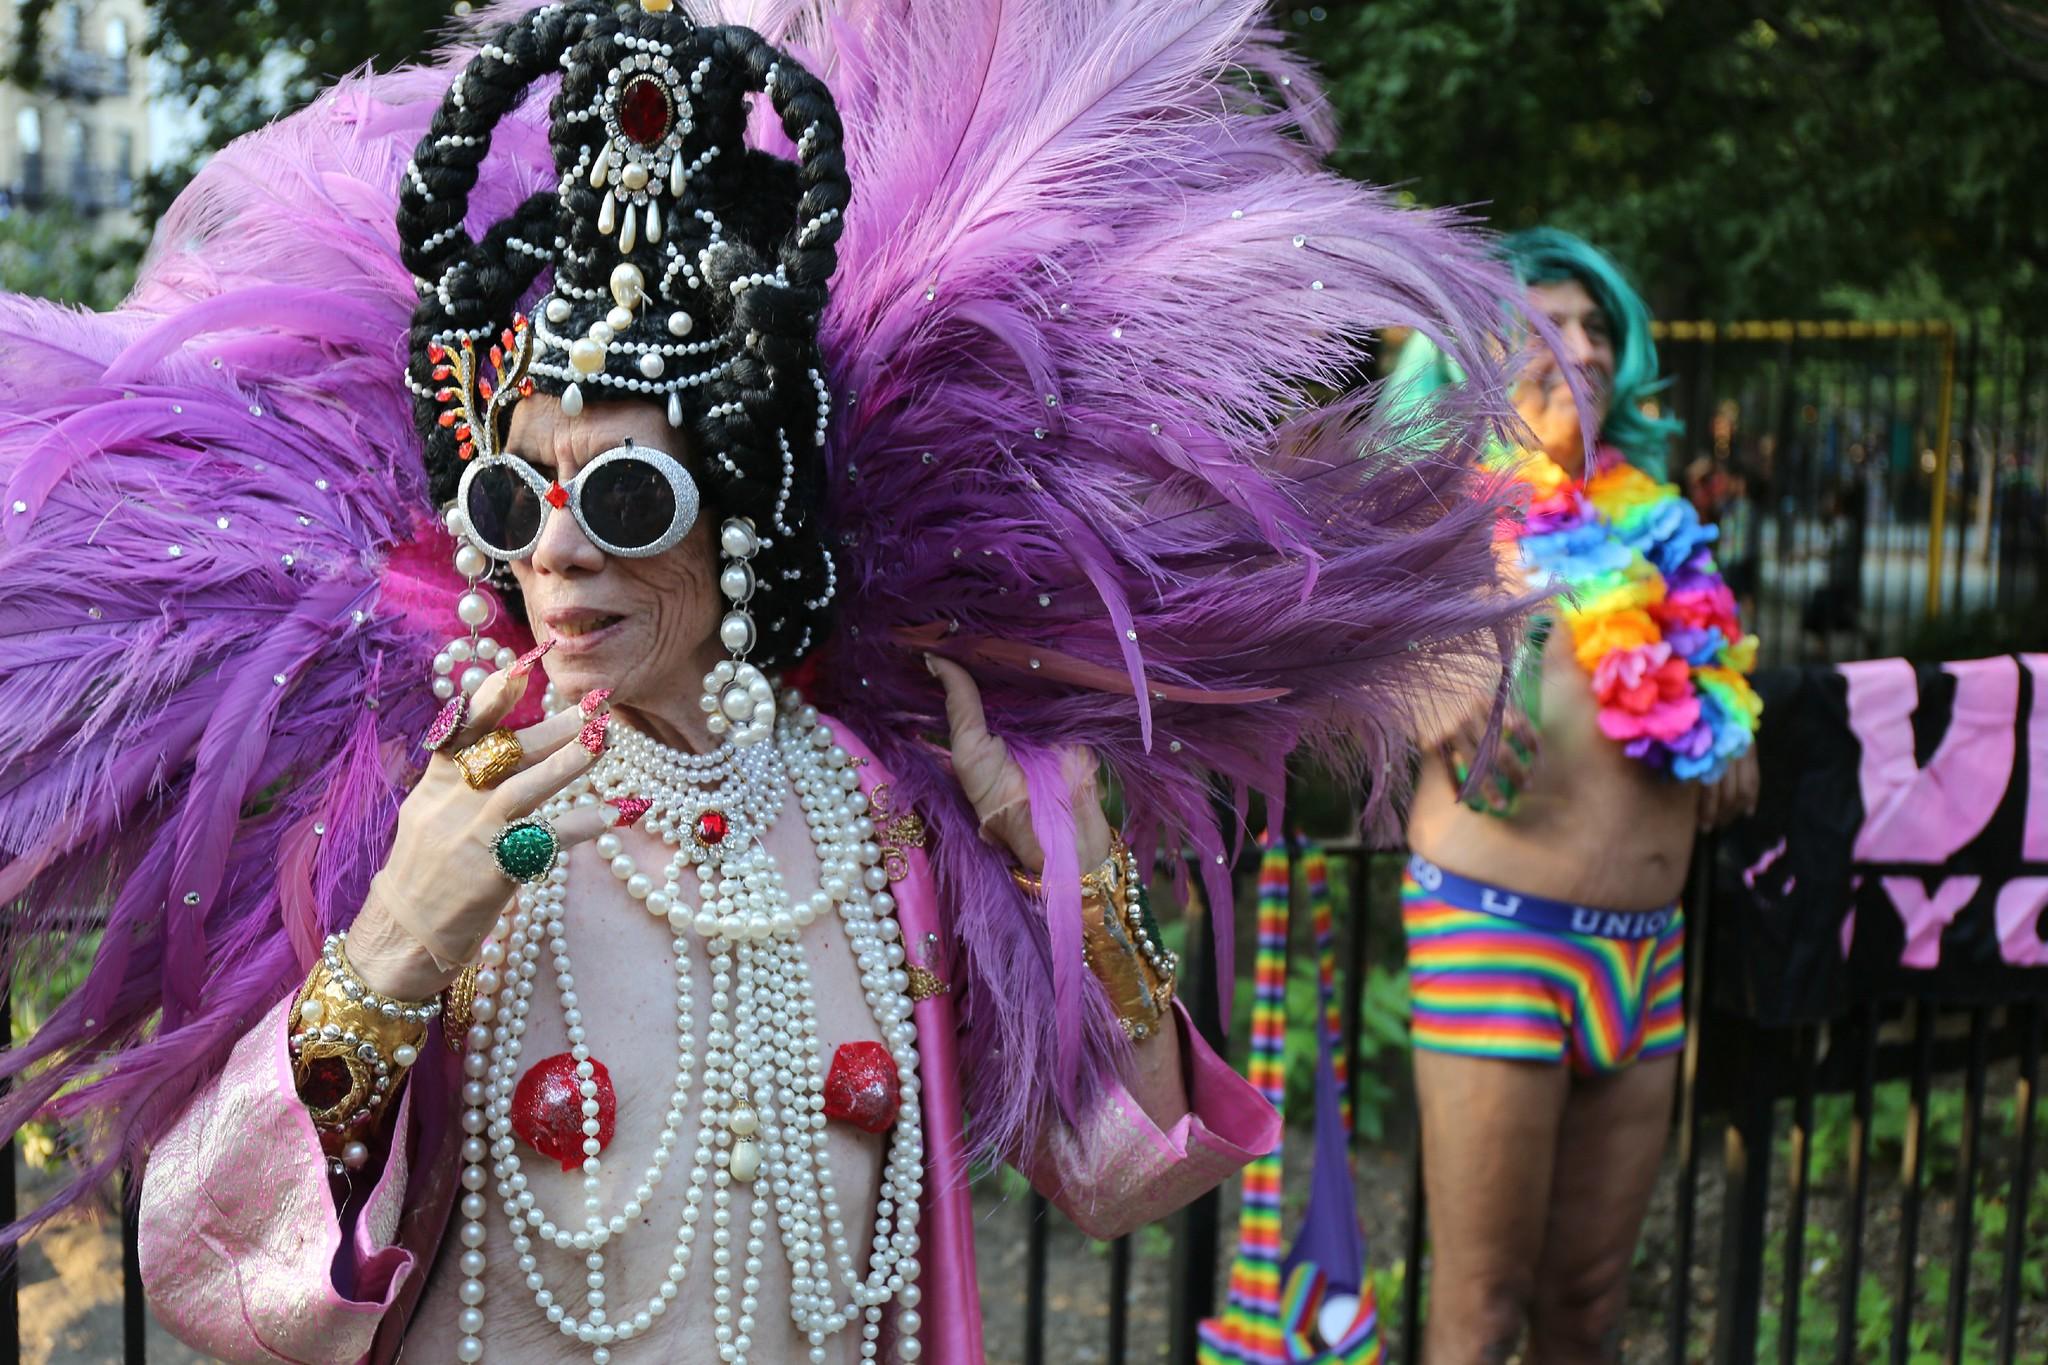 Nyc Drag Drag March 2015 Pride Nyc